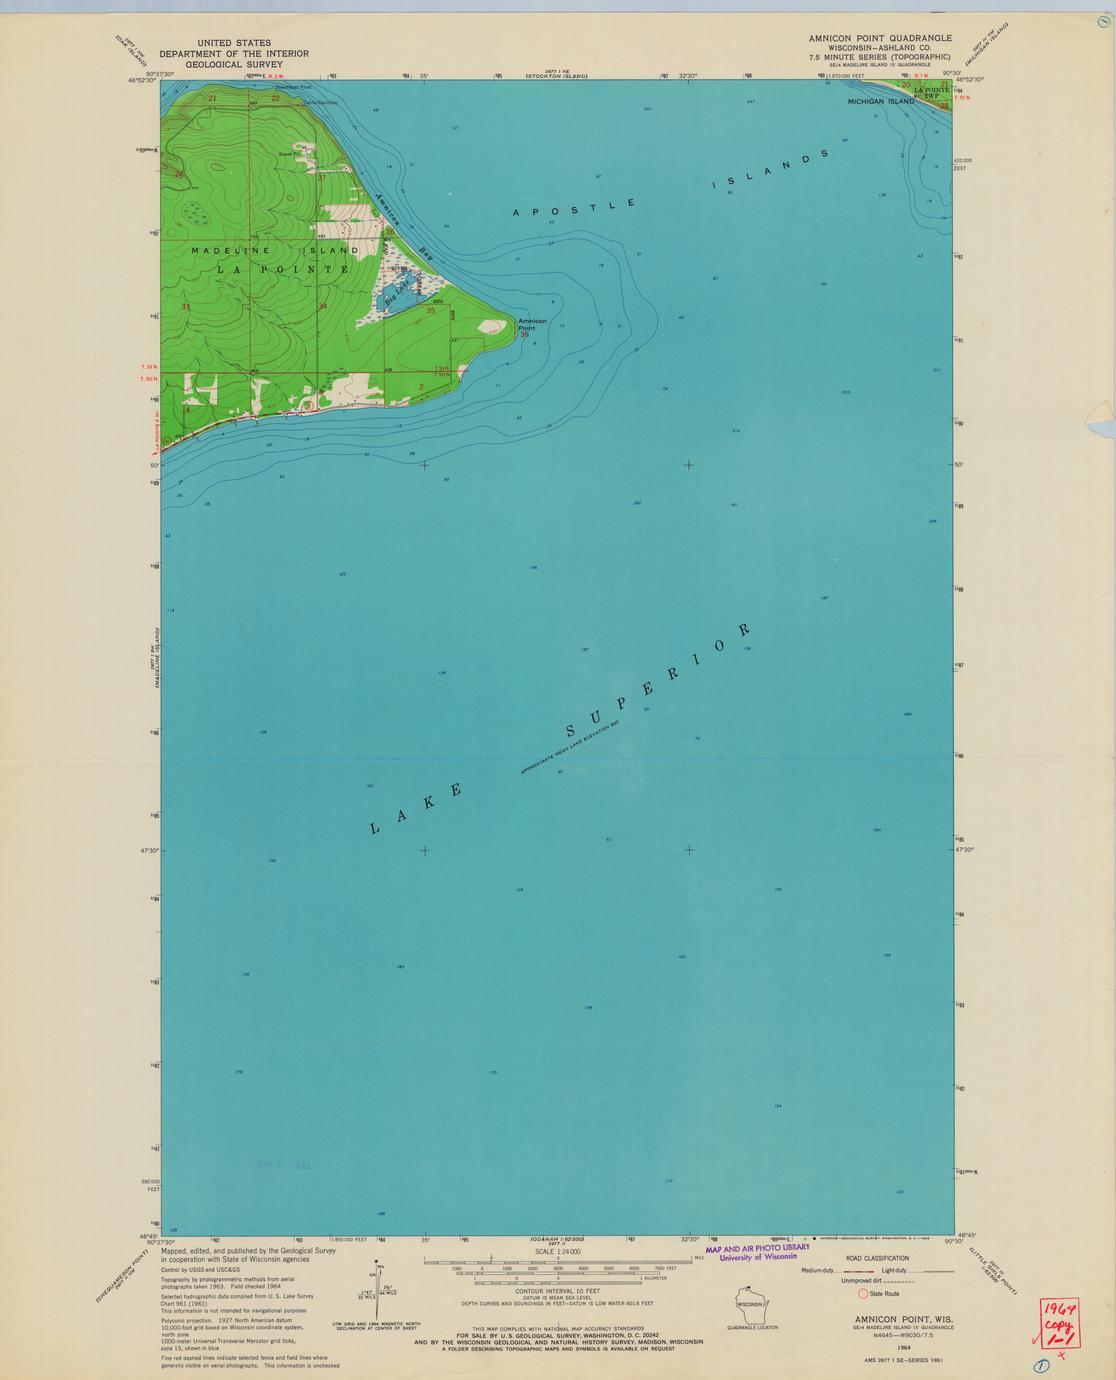 Amnicon Point quadrangle